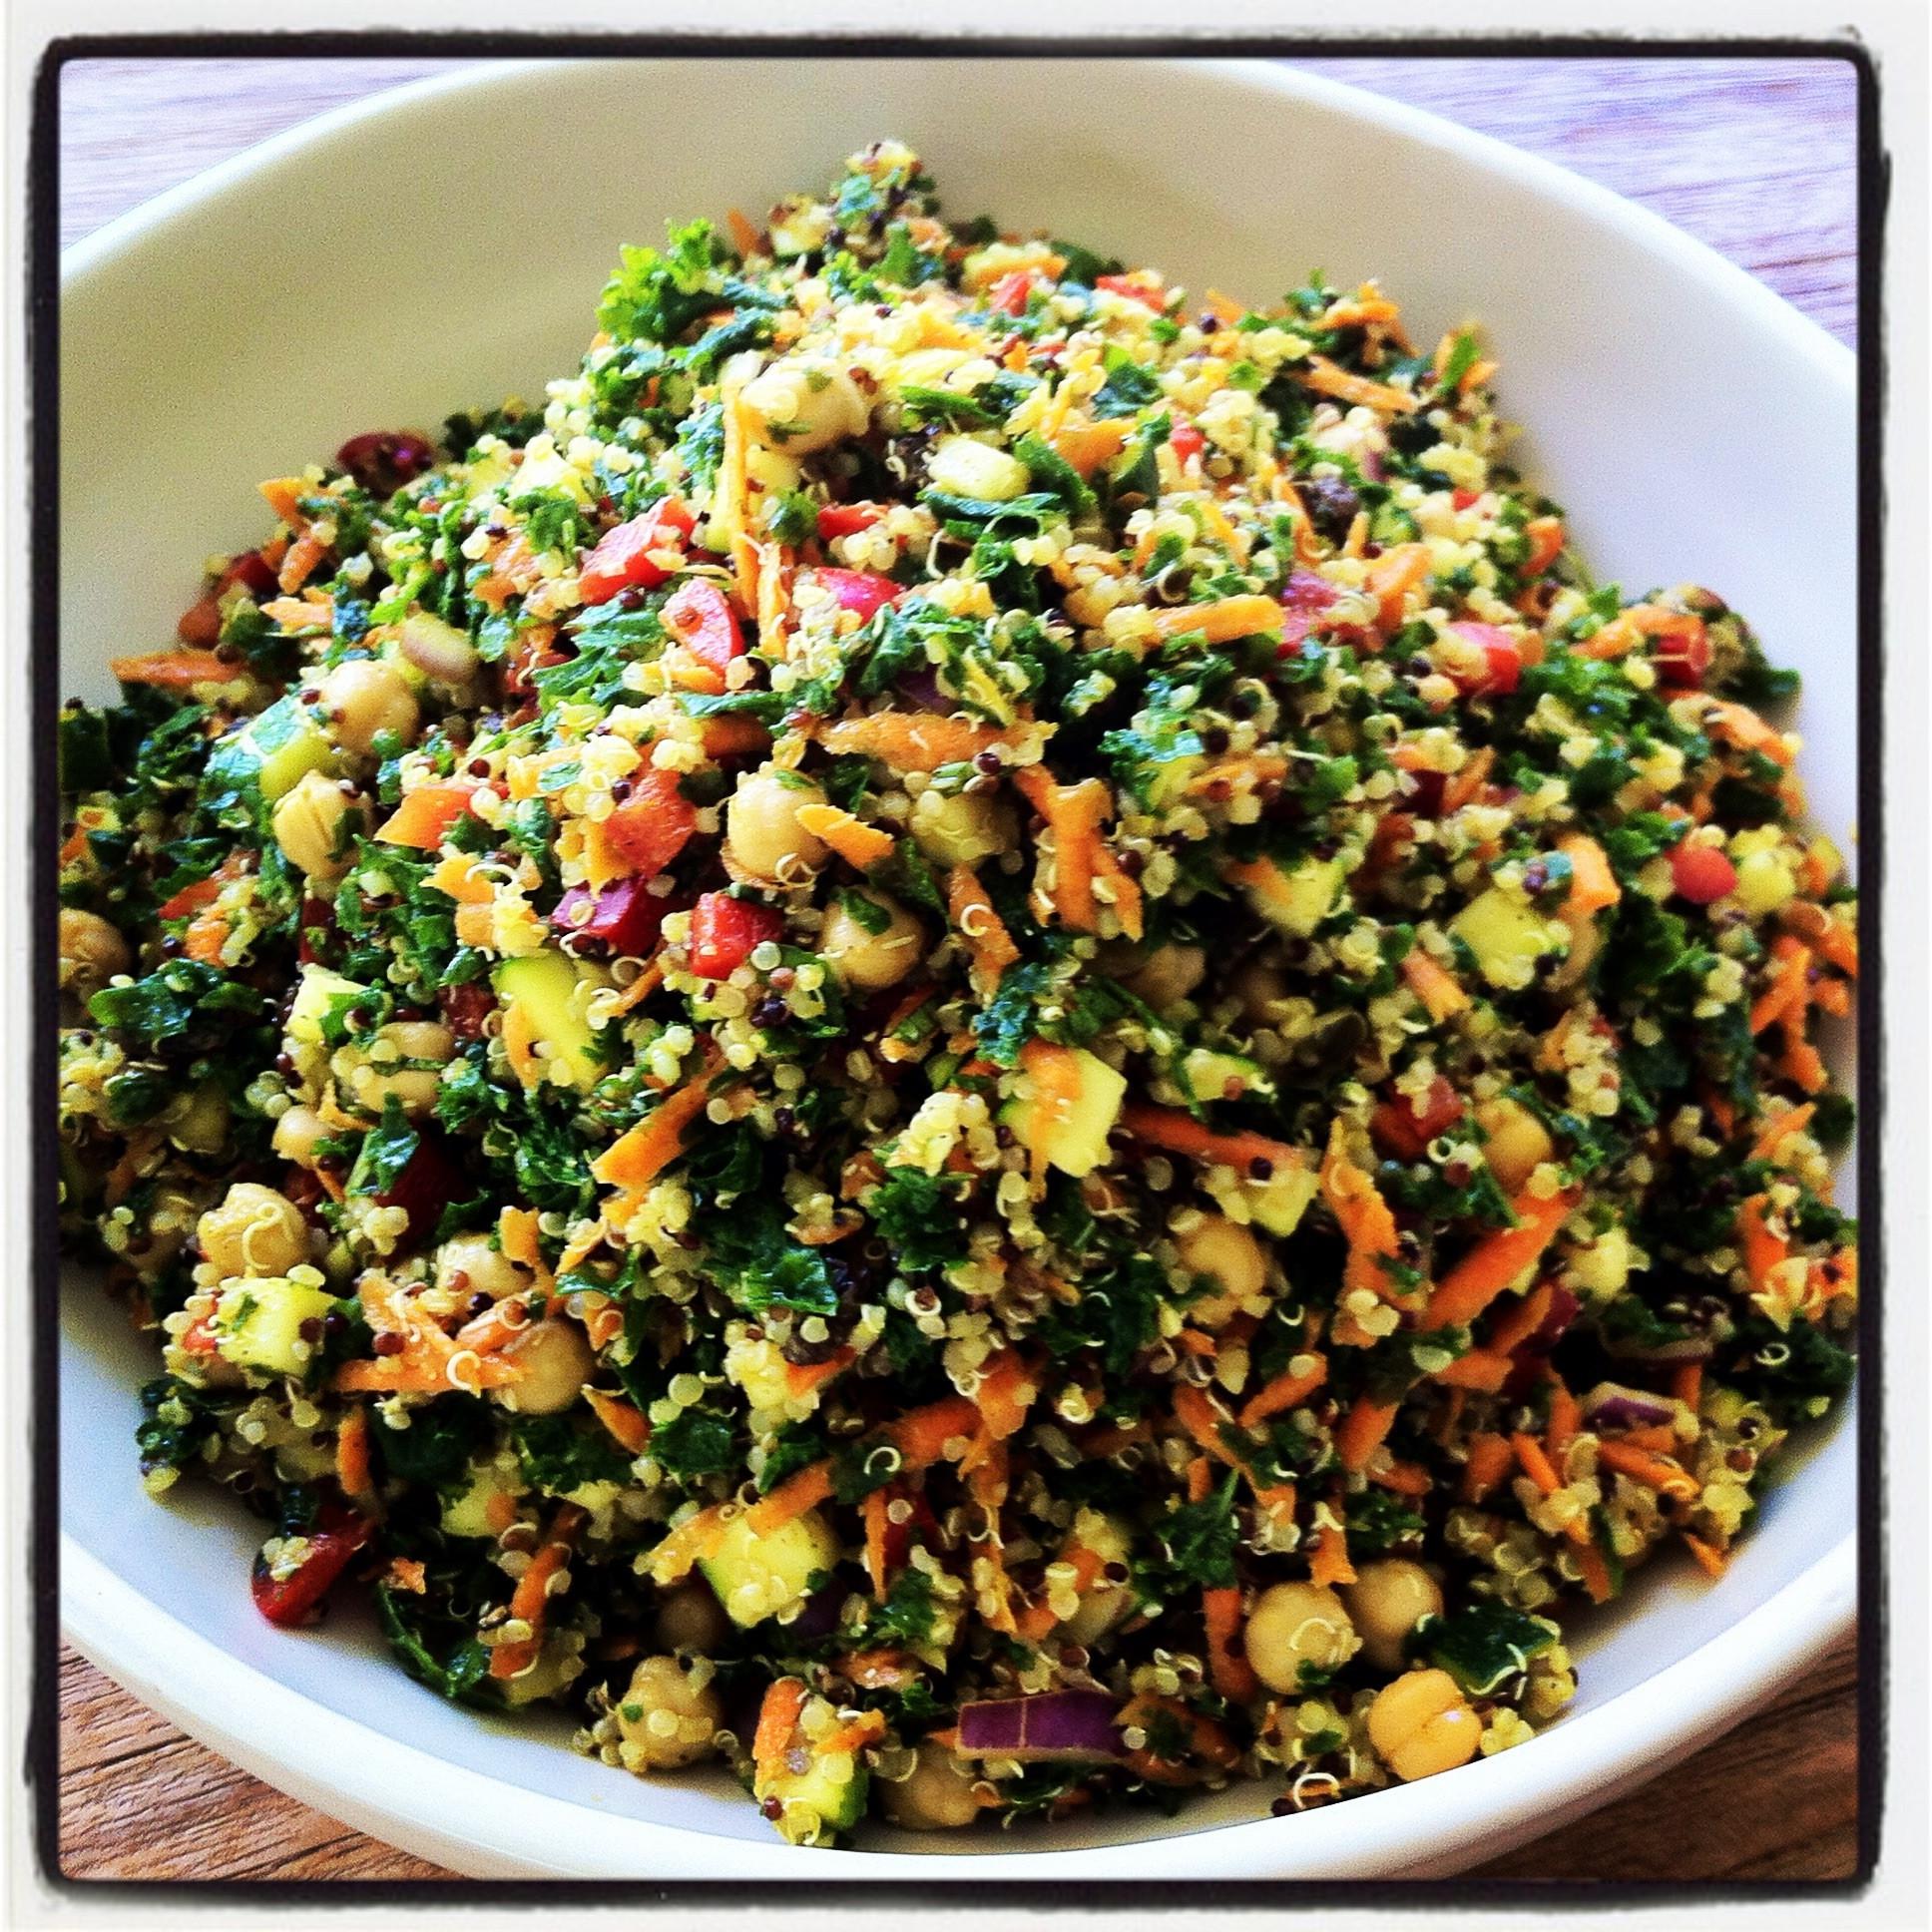 Quinoa Salad Recipe  A delicious cleansing recipe for spring